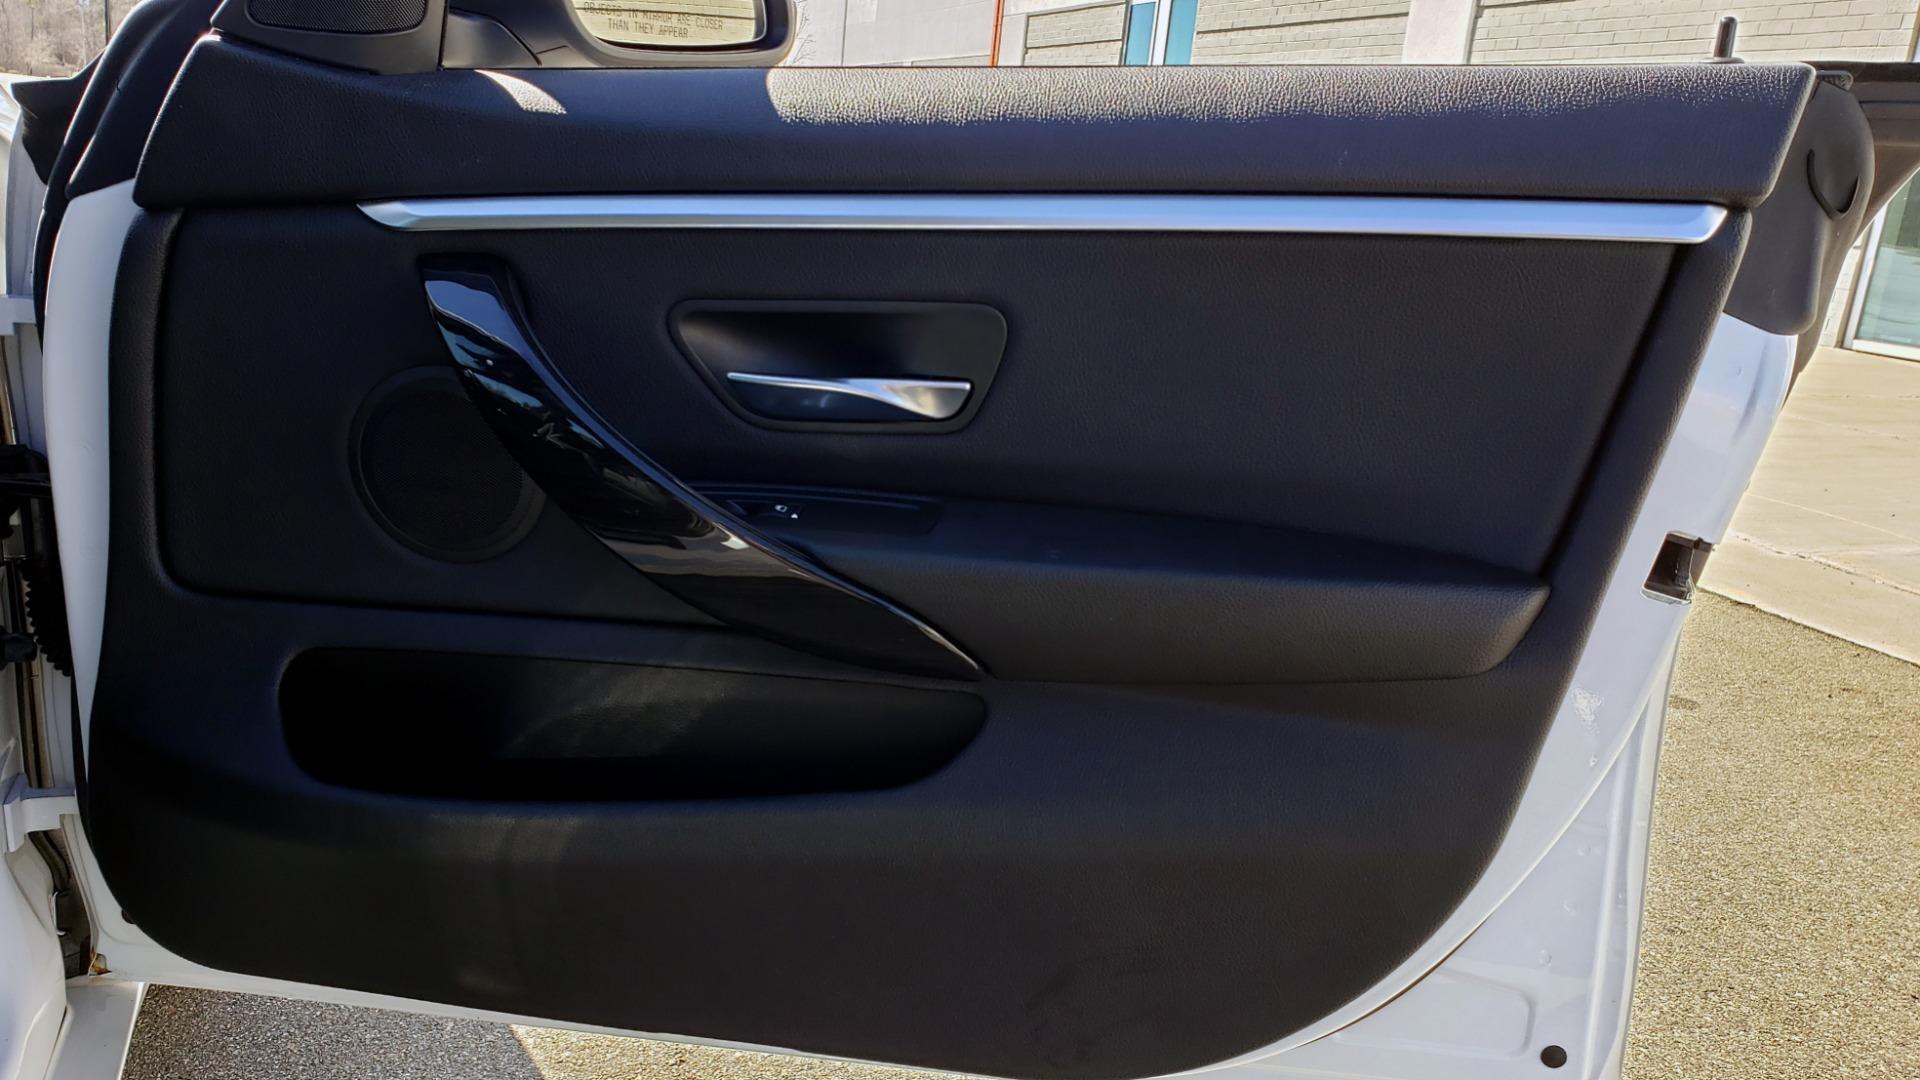 Used 2018 BMW 4 SERIES 430IXDRIVE / PREMIUM / NAV / SUNROOF / ESSENTIALS PKG for sale $28,995 at Formula Imports in Charlotte NC 28227 67